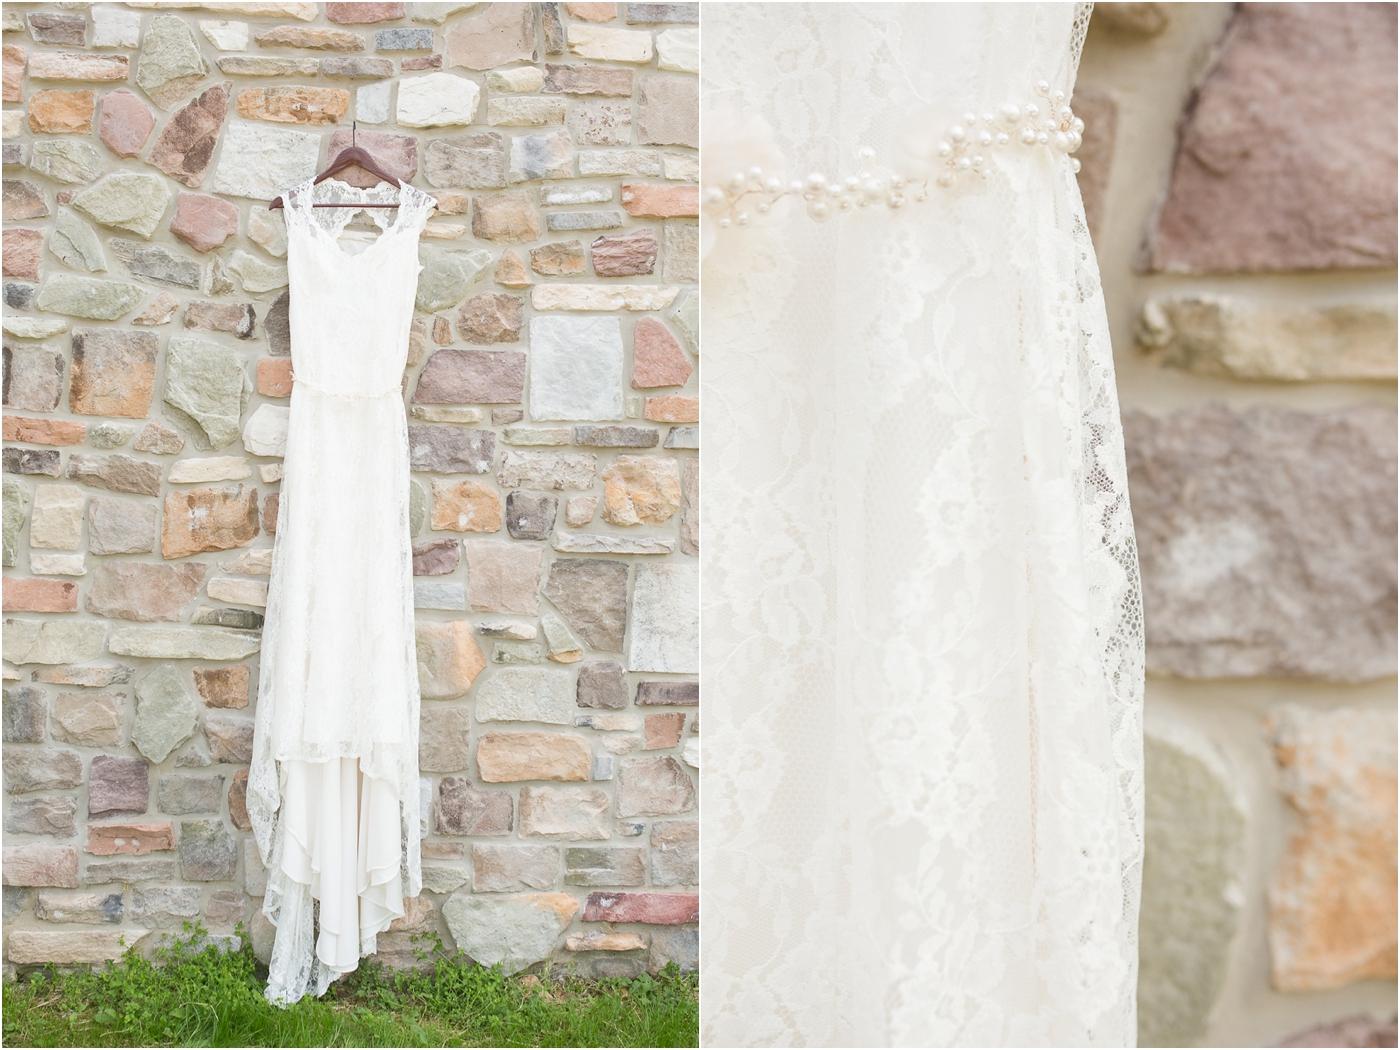 Gettysburg-lodges-wedding-photos-17.jpg